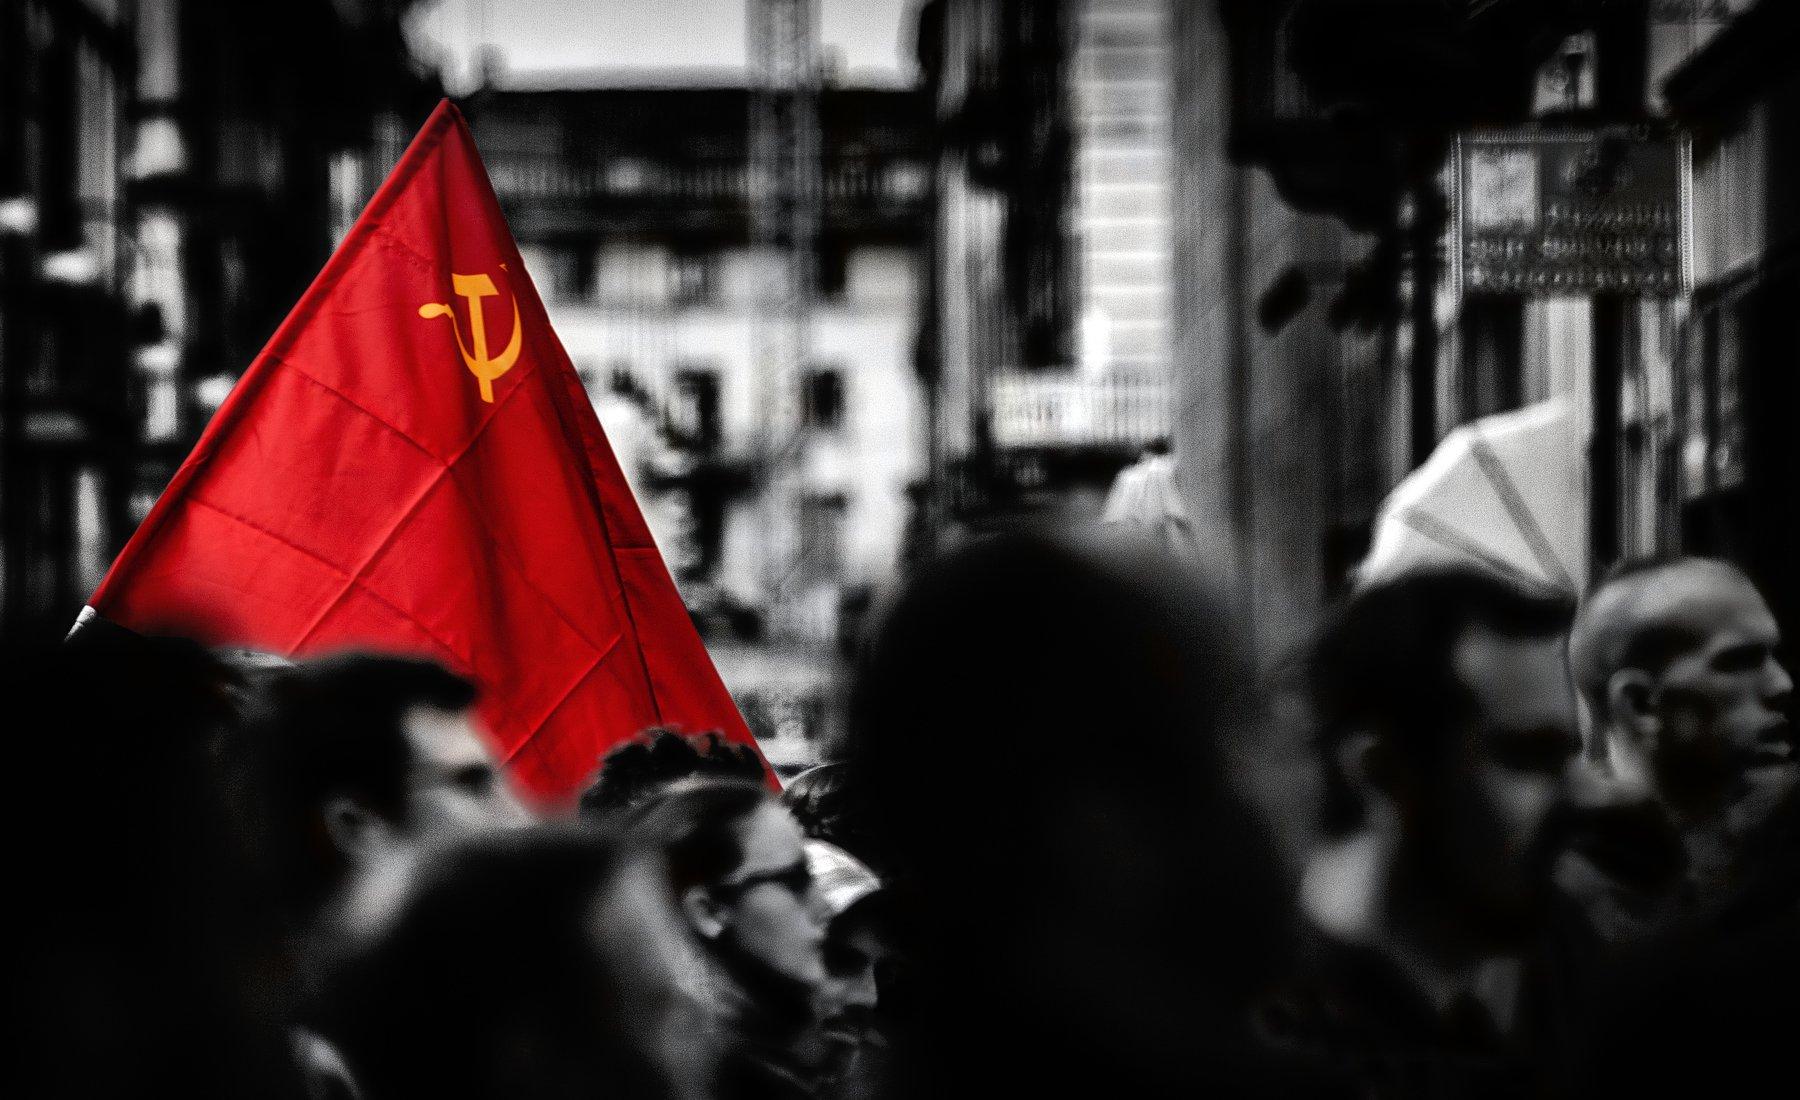 демонстрация, флаг, красный флаг, Alexandr Bezmolitvenny